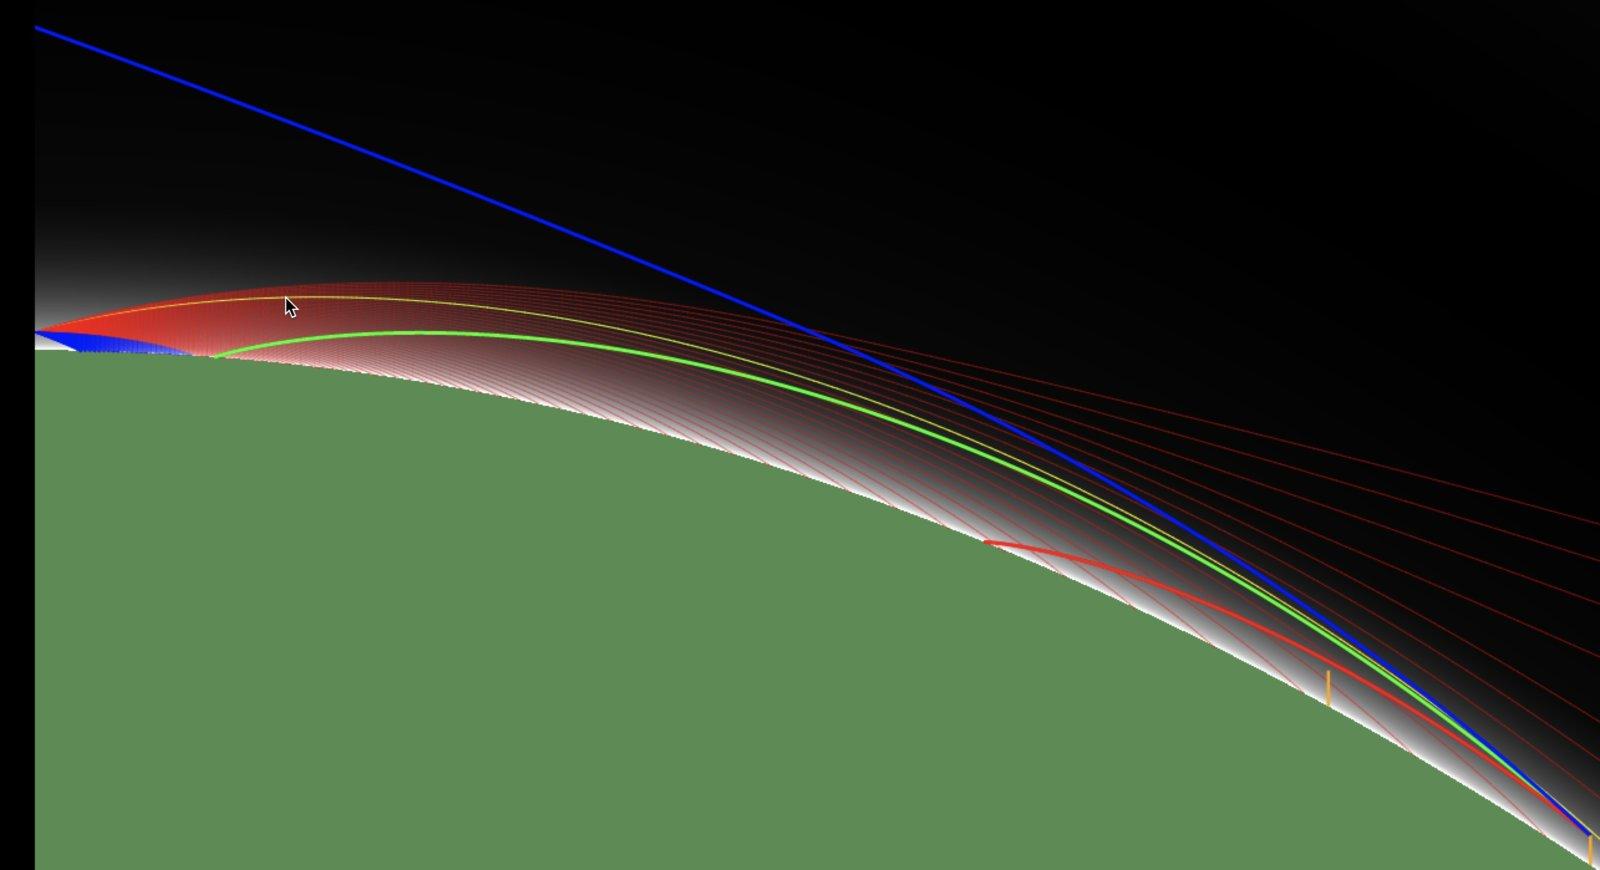 Metabunk 2019-02-25 07-20-11.jpg